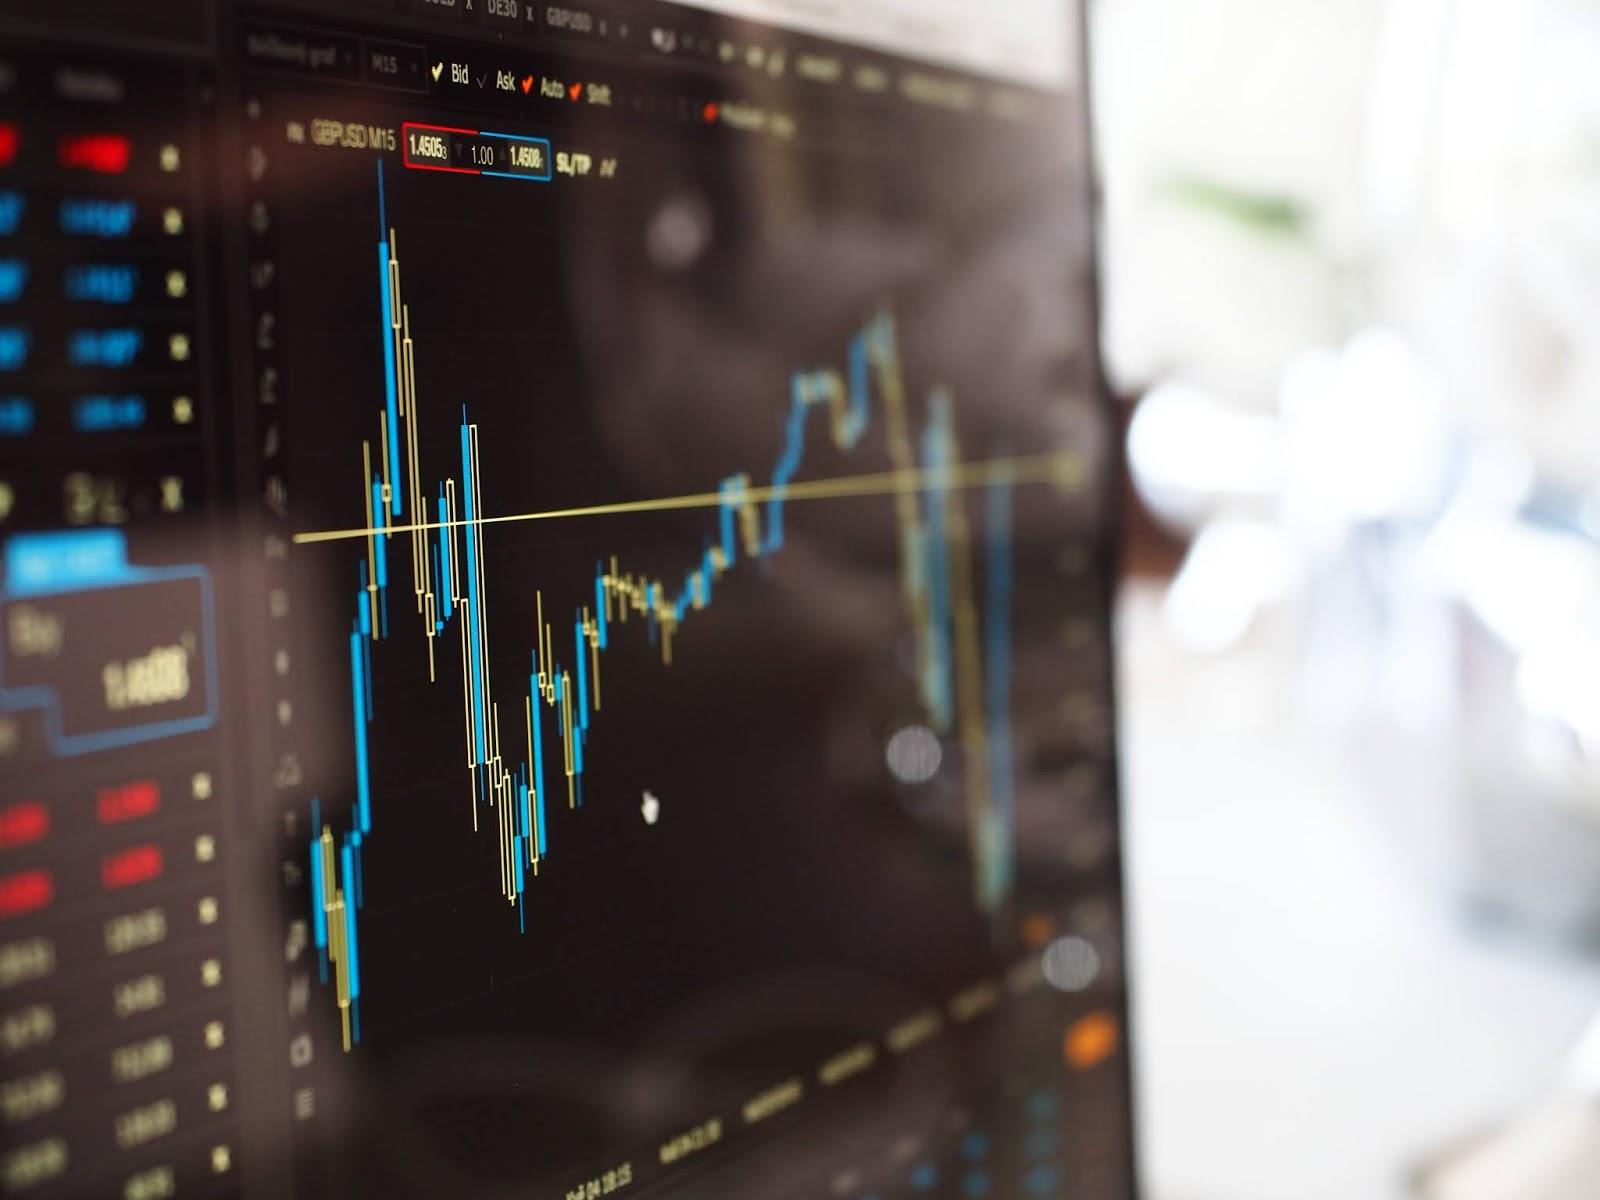 Форекс прогноз основных валютных пар на 10 июня